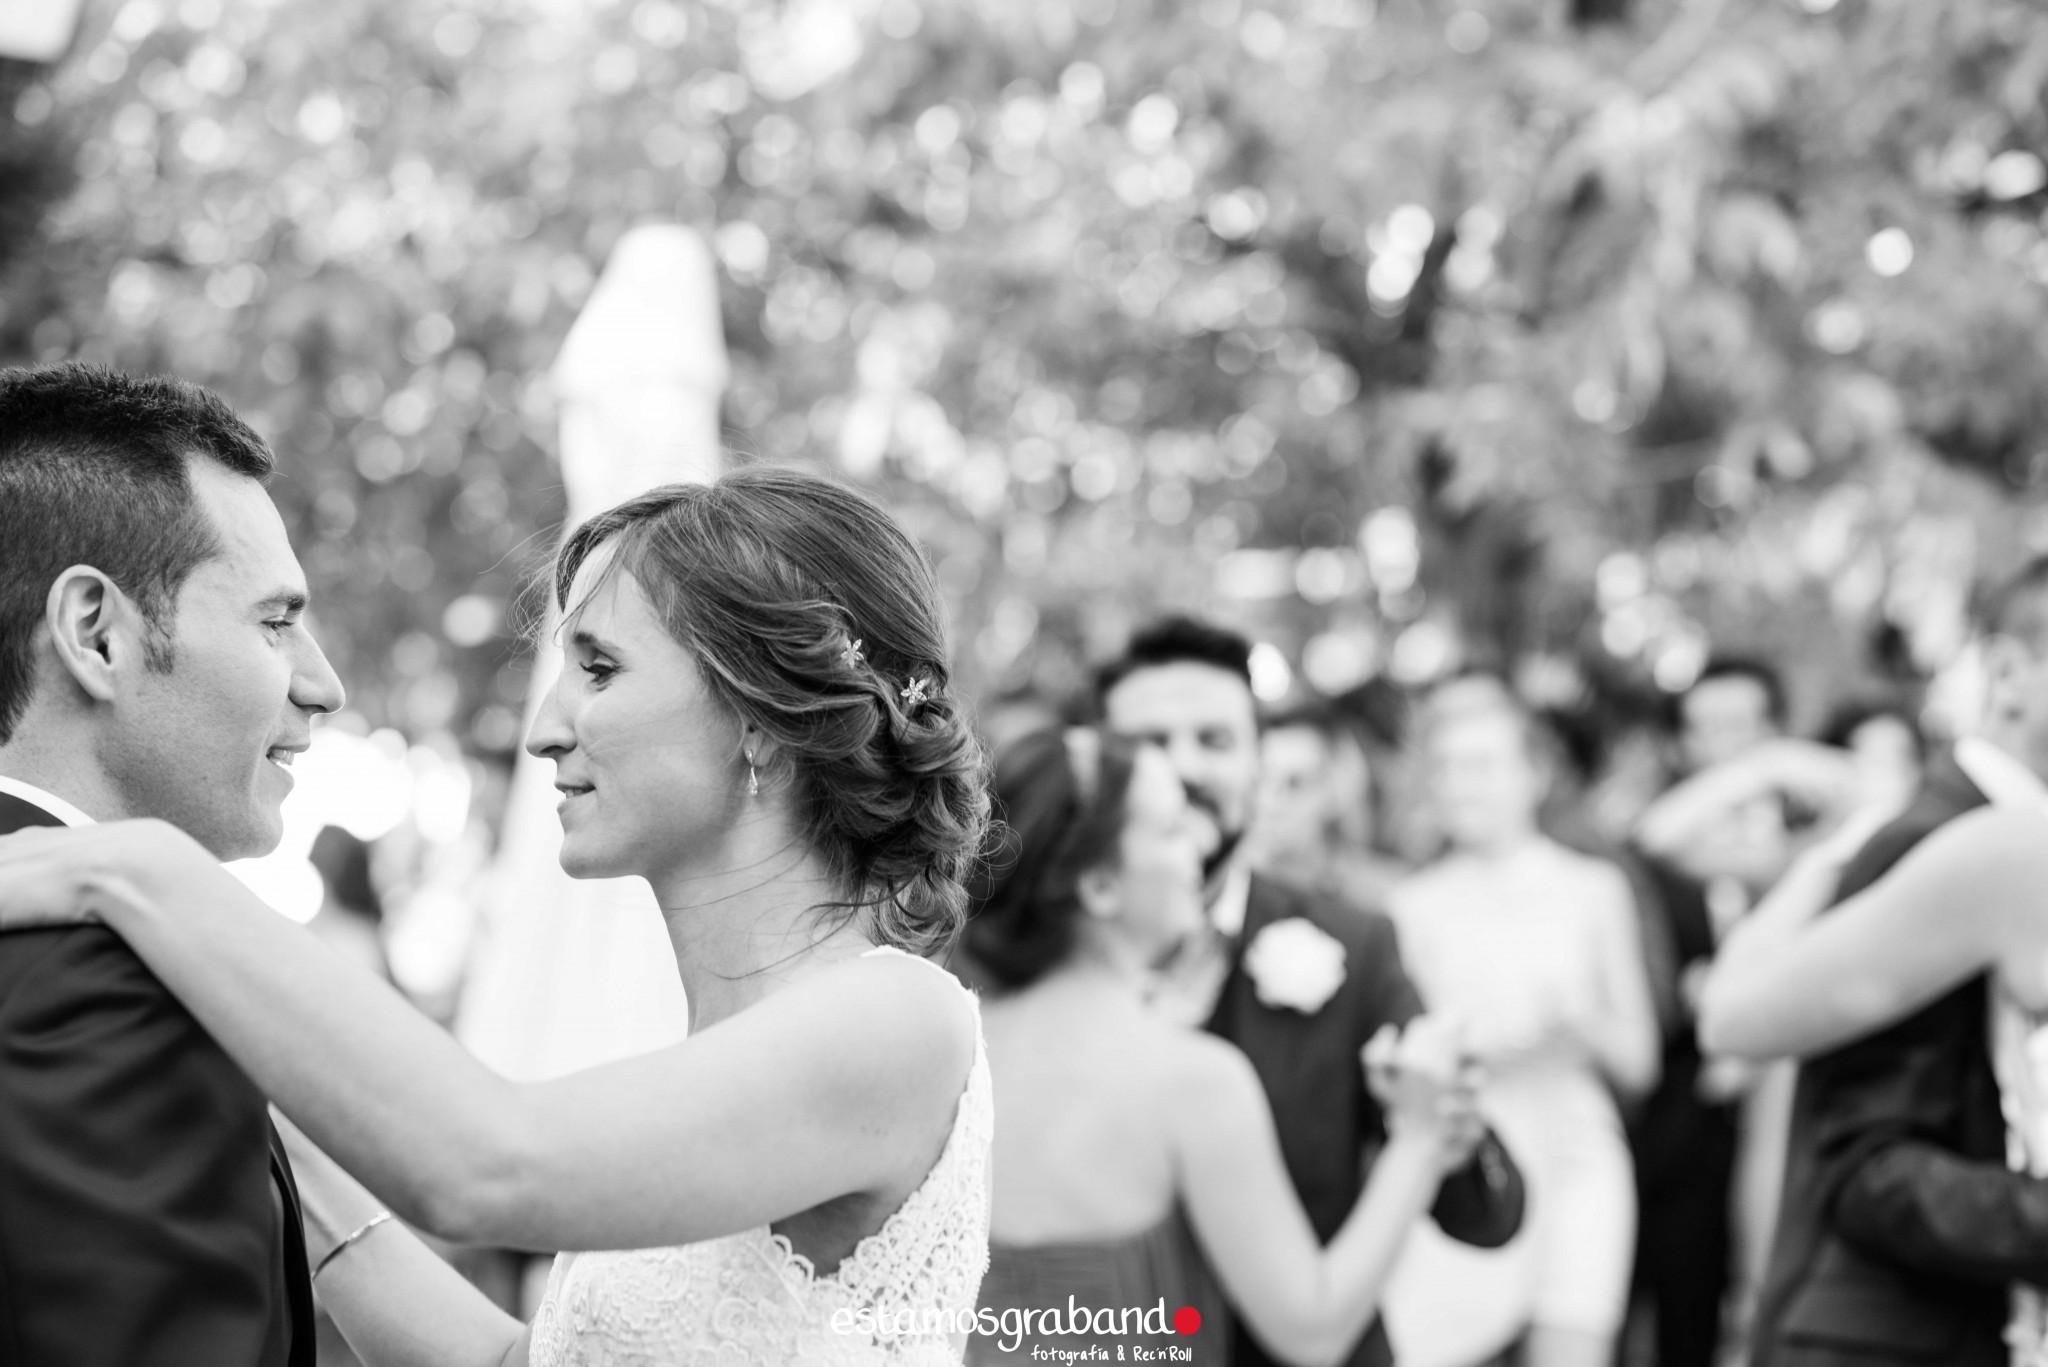 LEO-Y-PEDRO-68 Fotografía de Boda_Leo & Pedro [Jardines de la Mamunia, Granada] - video boda cadiz